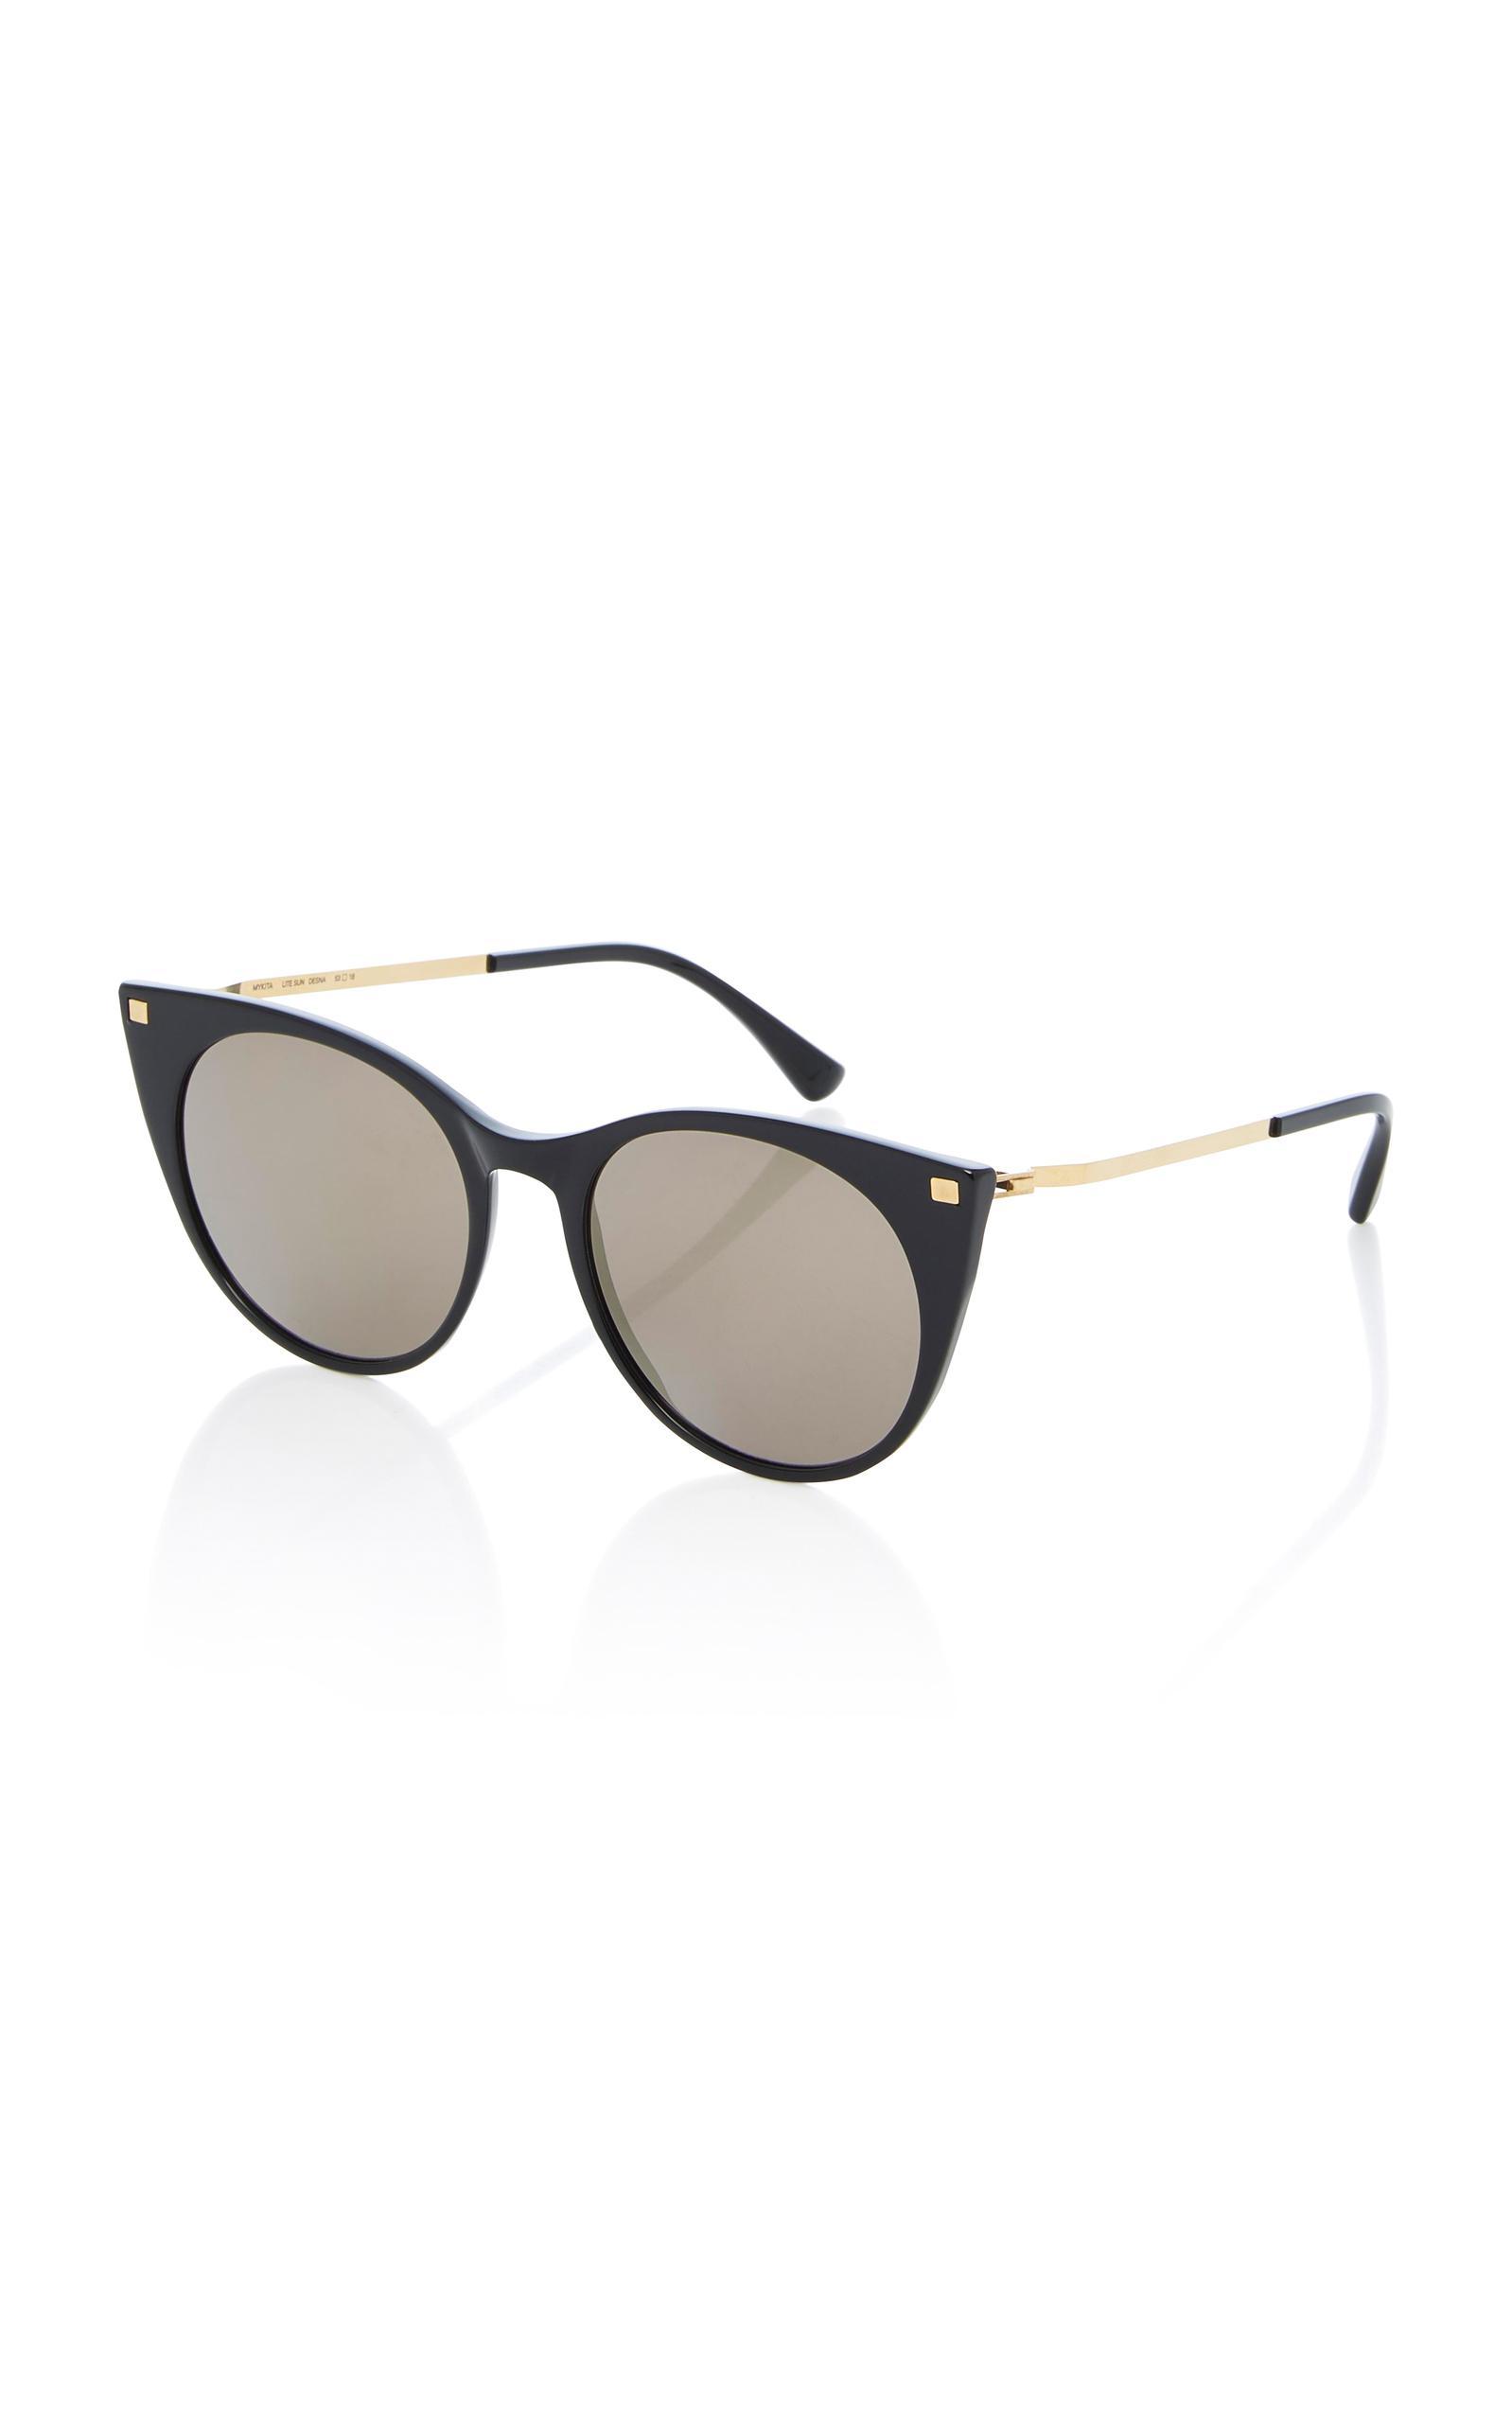 Desna Gold-Tone and Acetate Round-Frame Sunglasses Mykita yoL1NR3xH